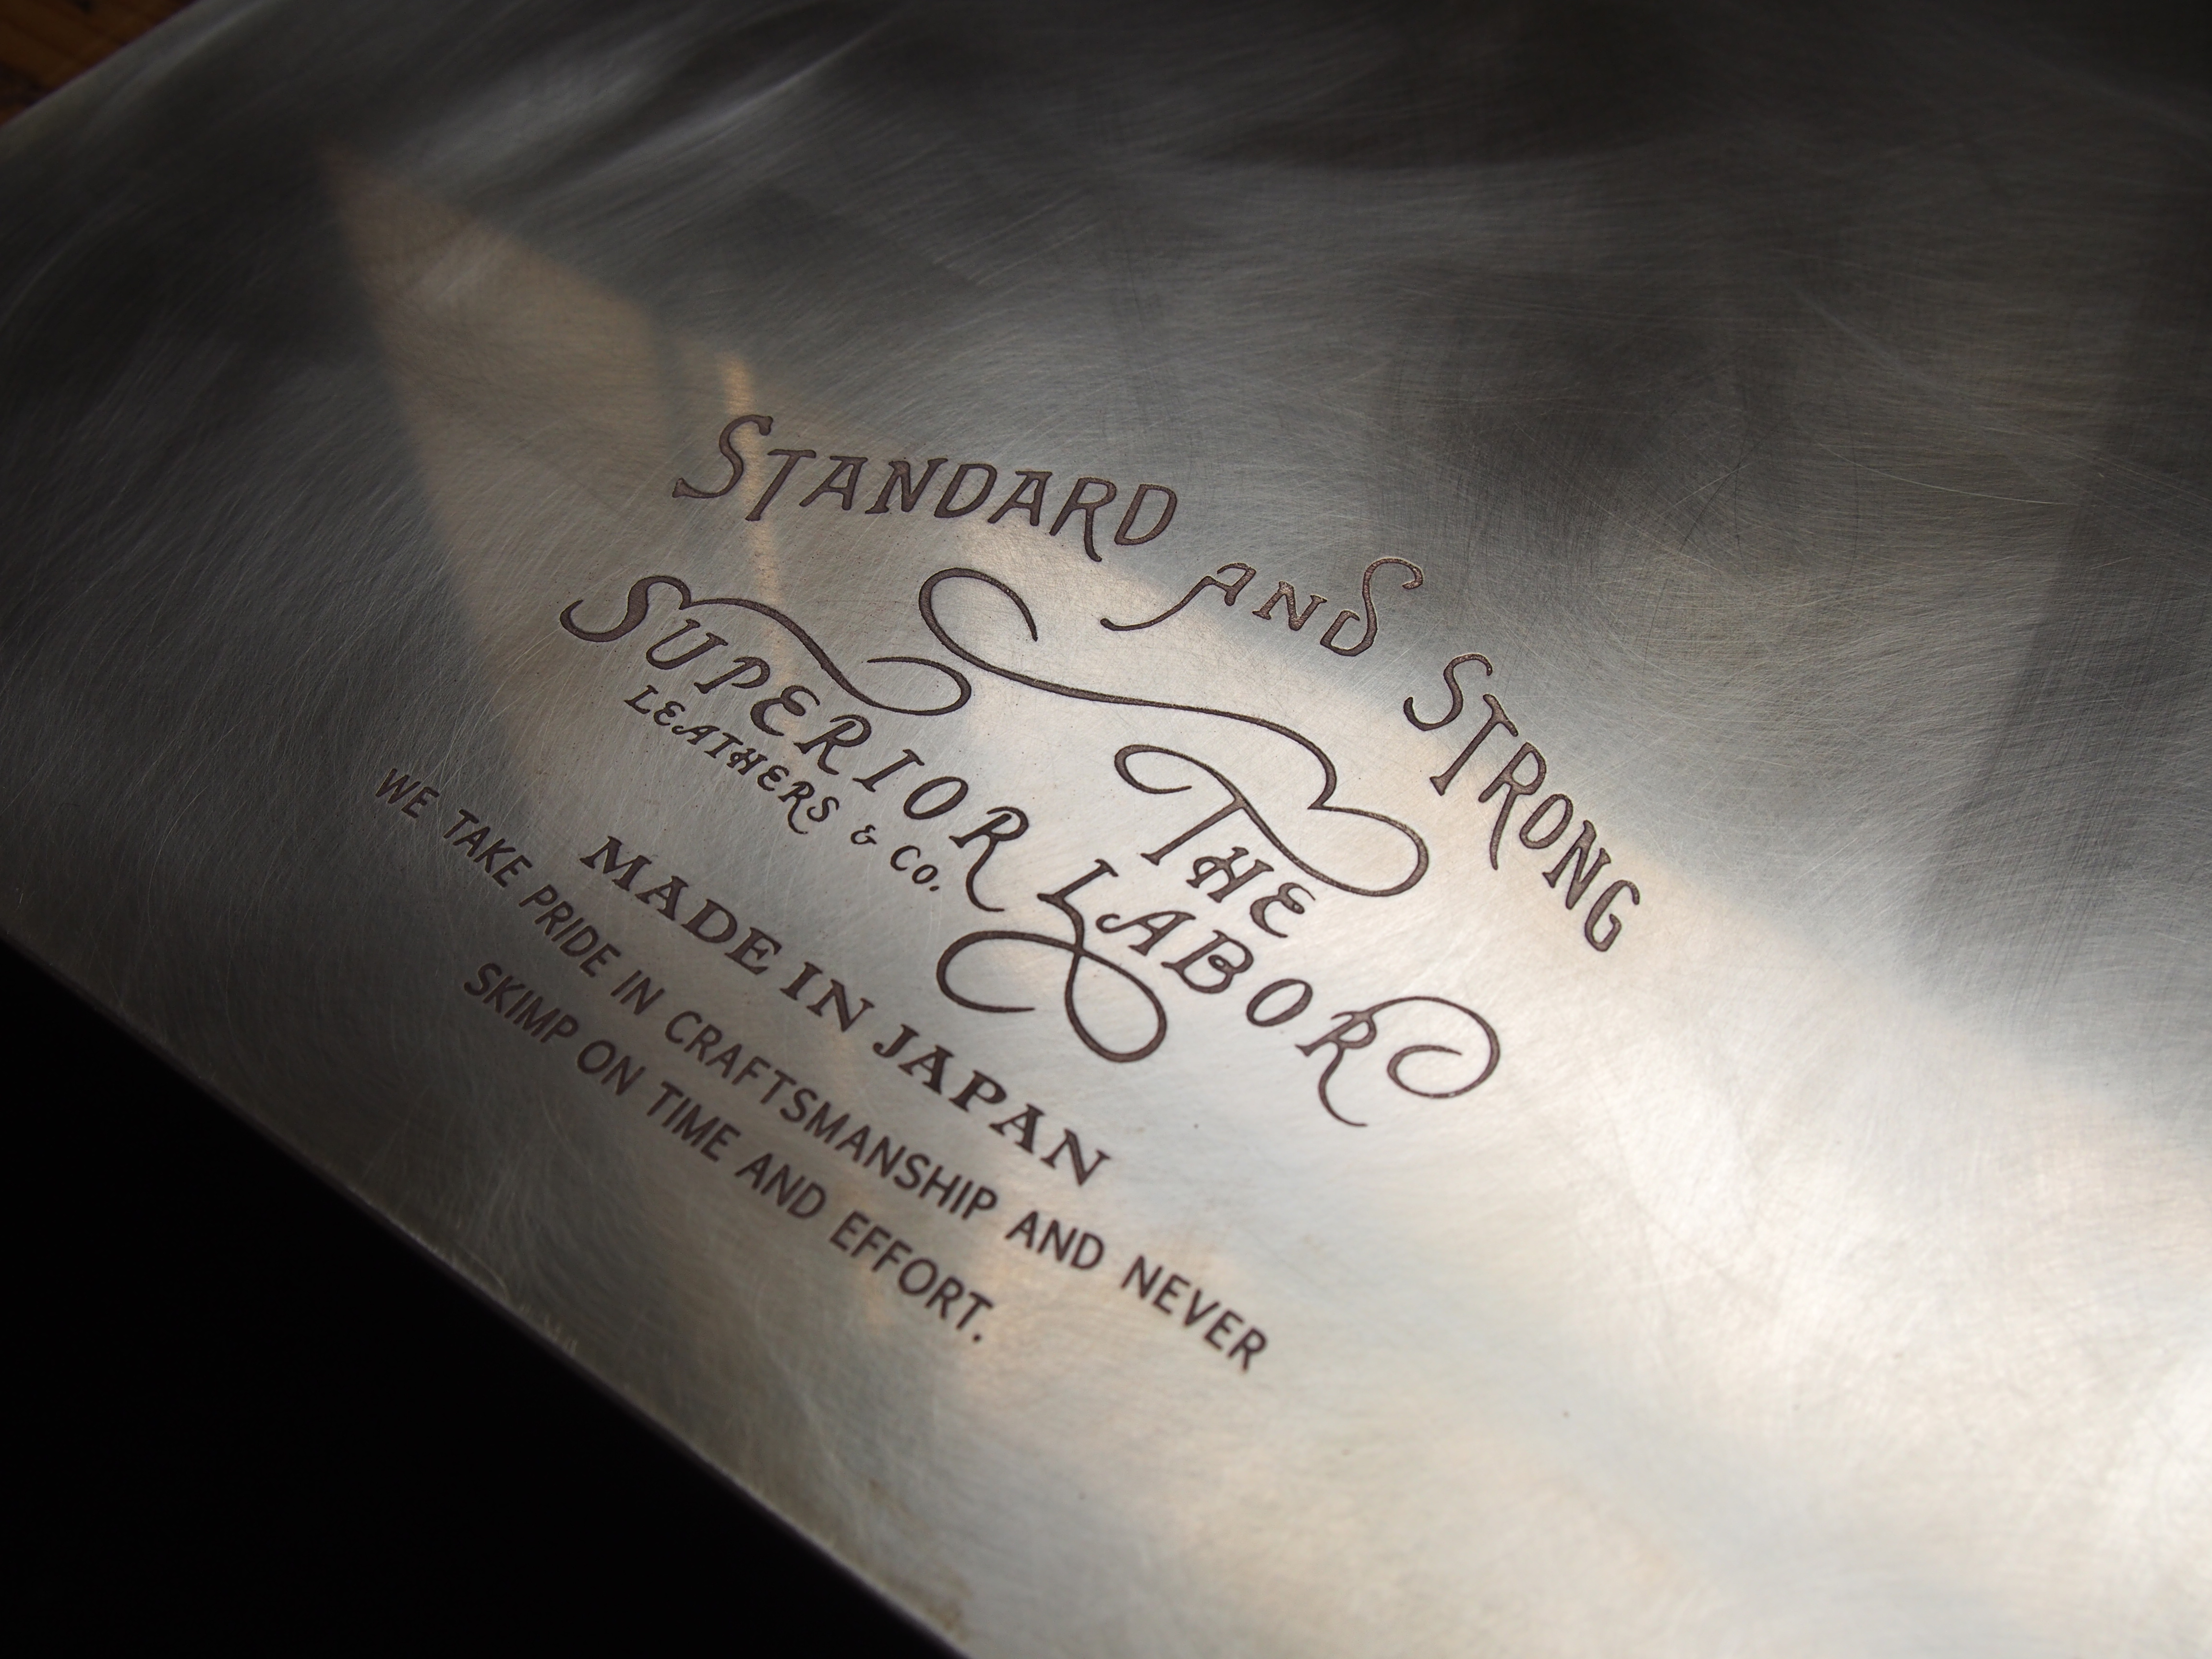 Superior Labor Brass Clipboard Wonderpens.ca wonder pens Toronto Canada